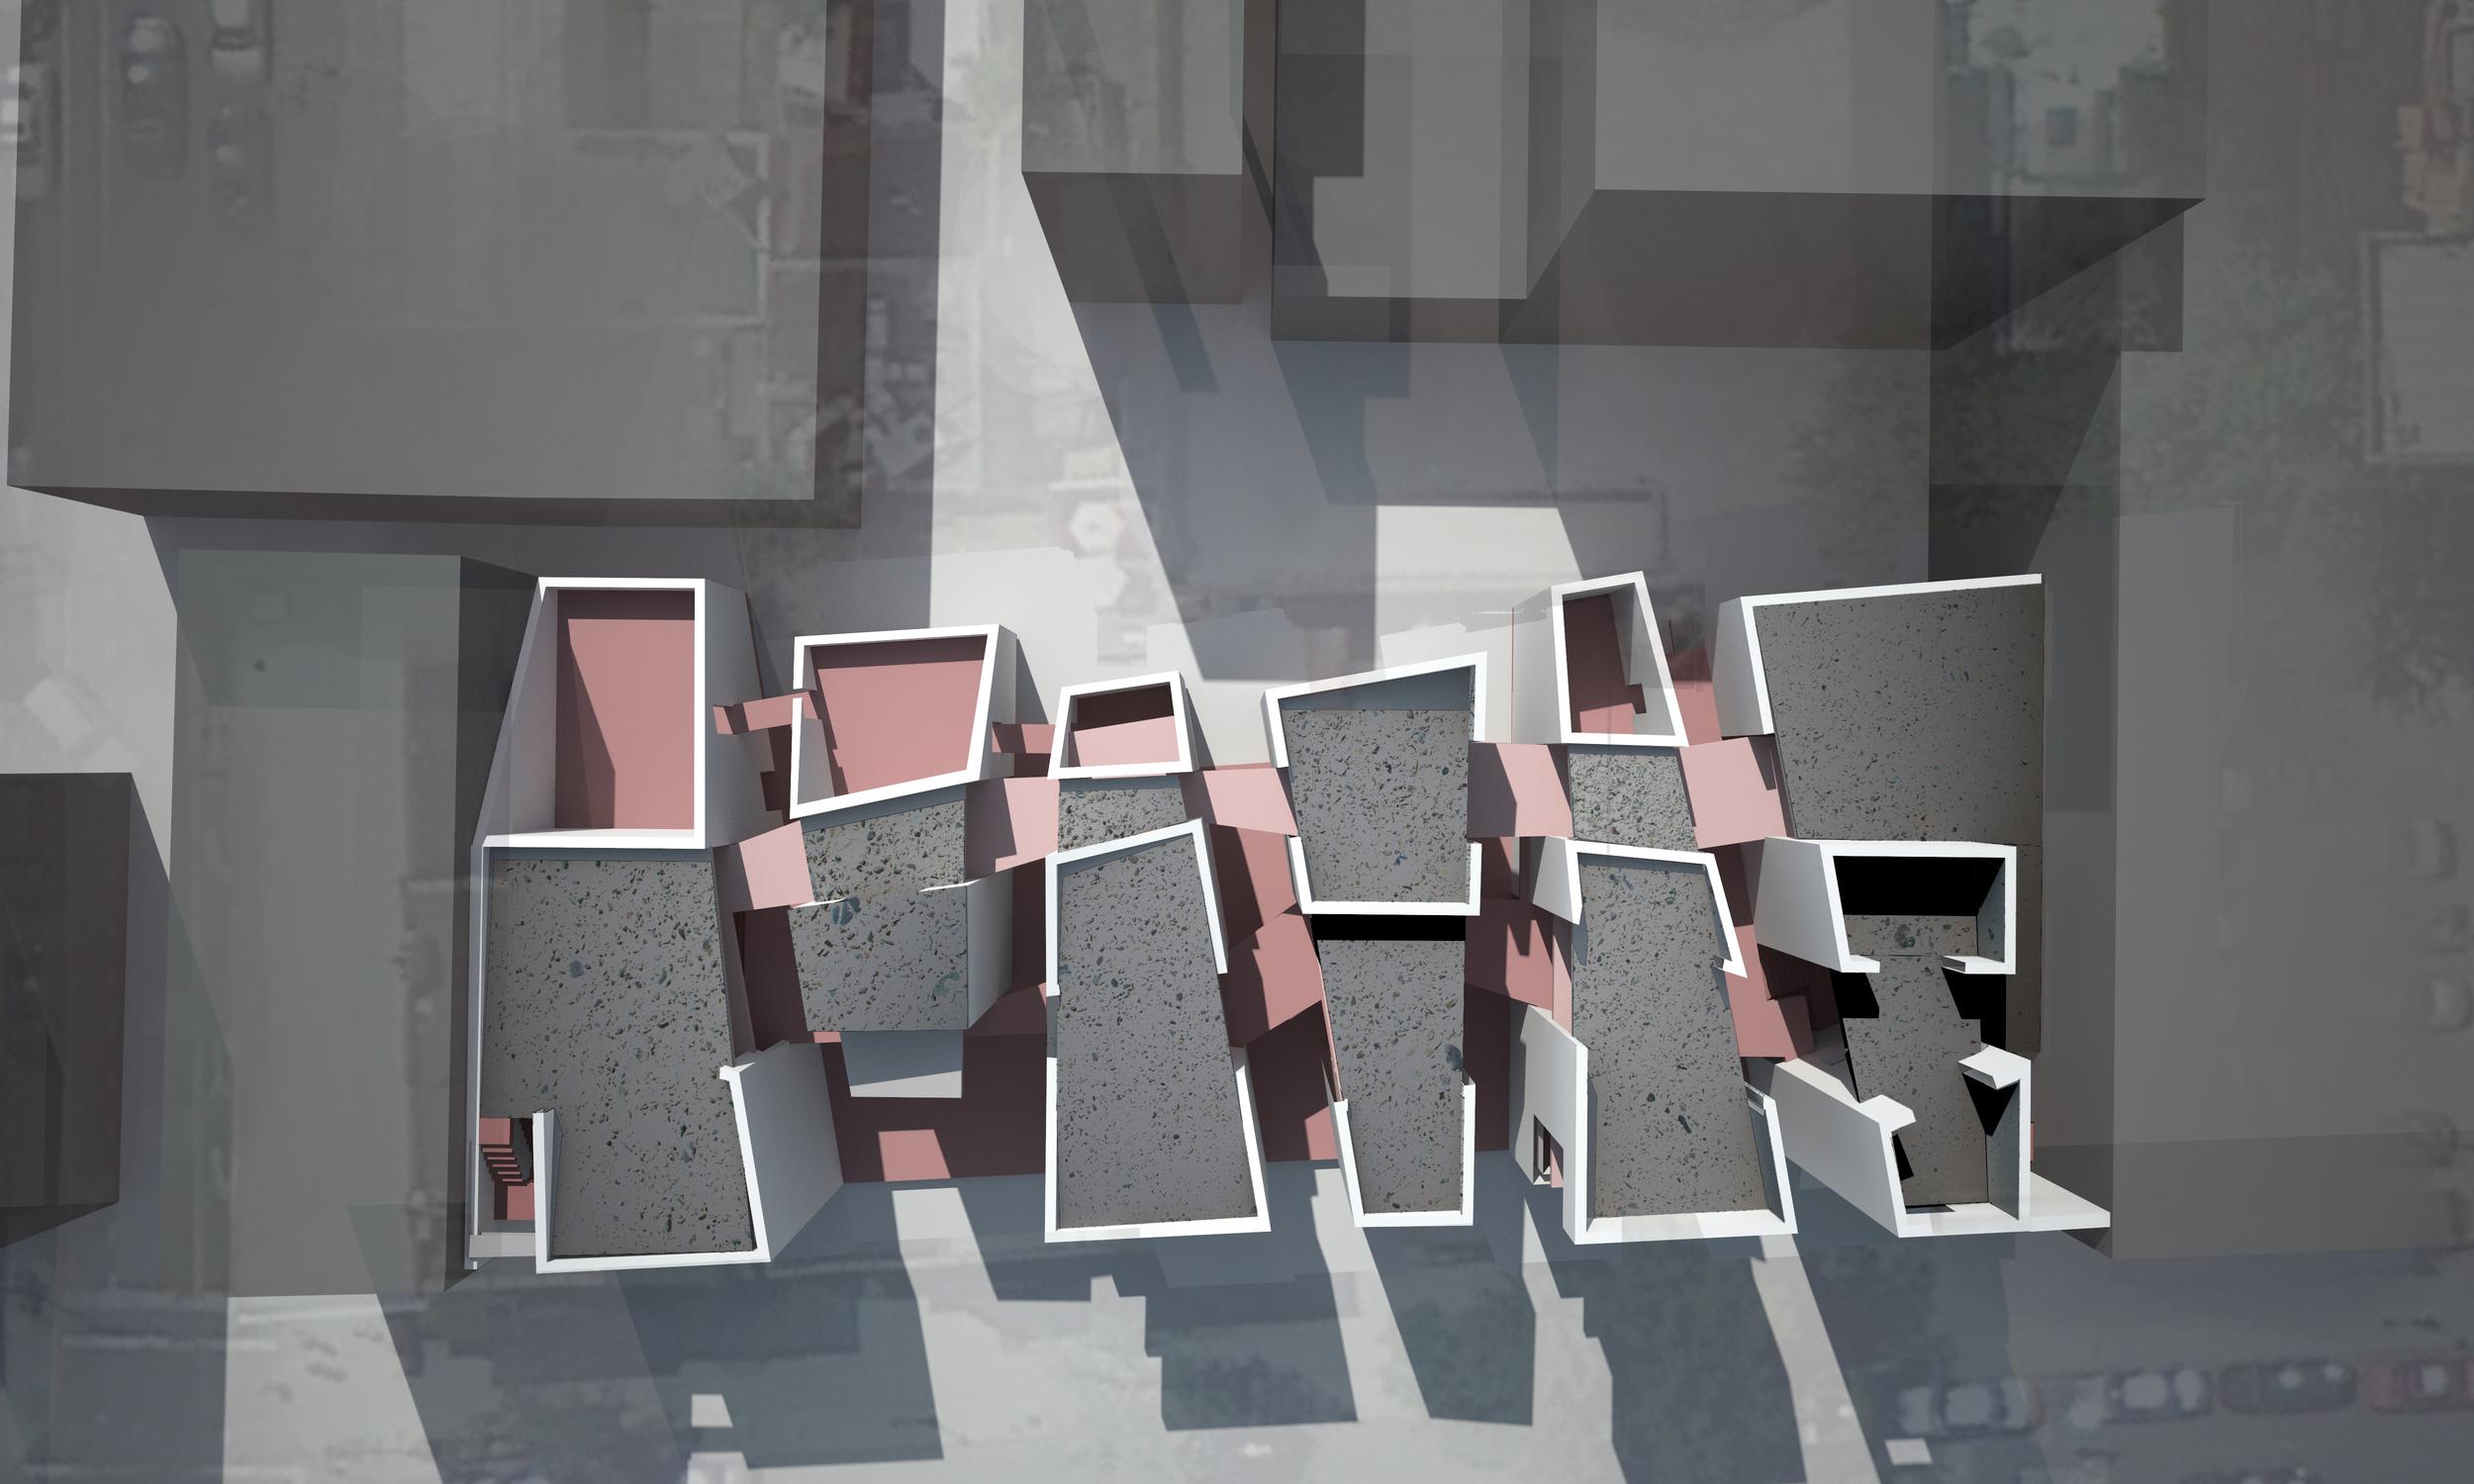 pland_roof.jpg